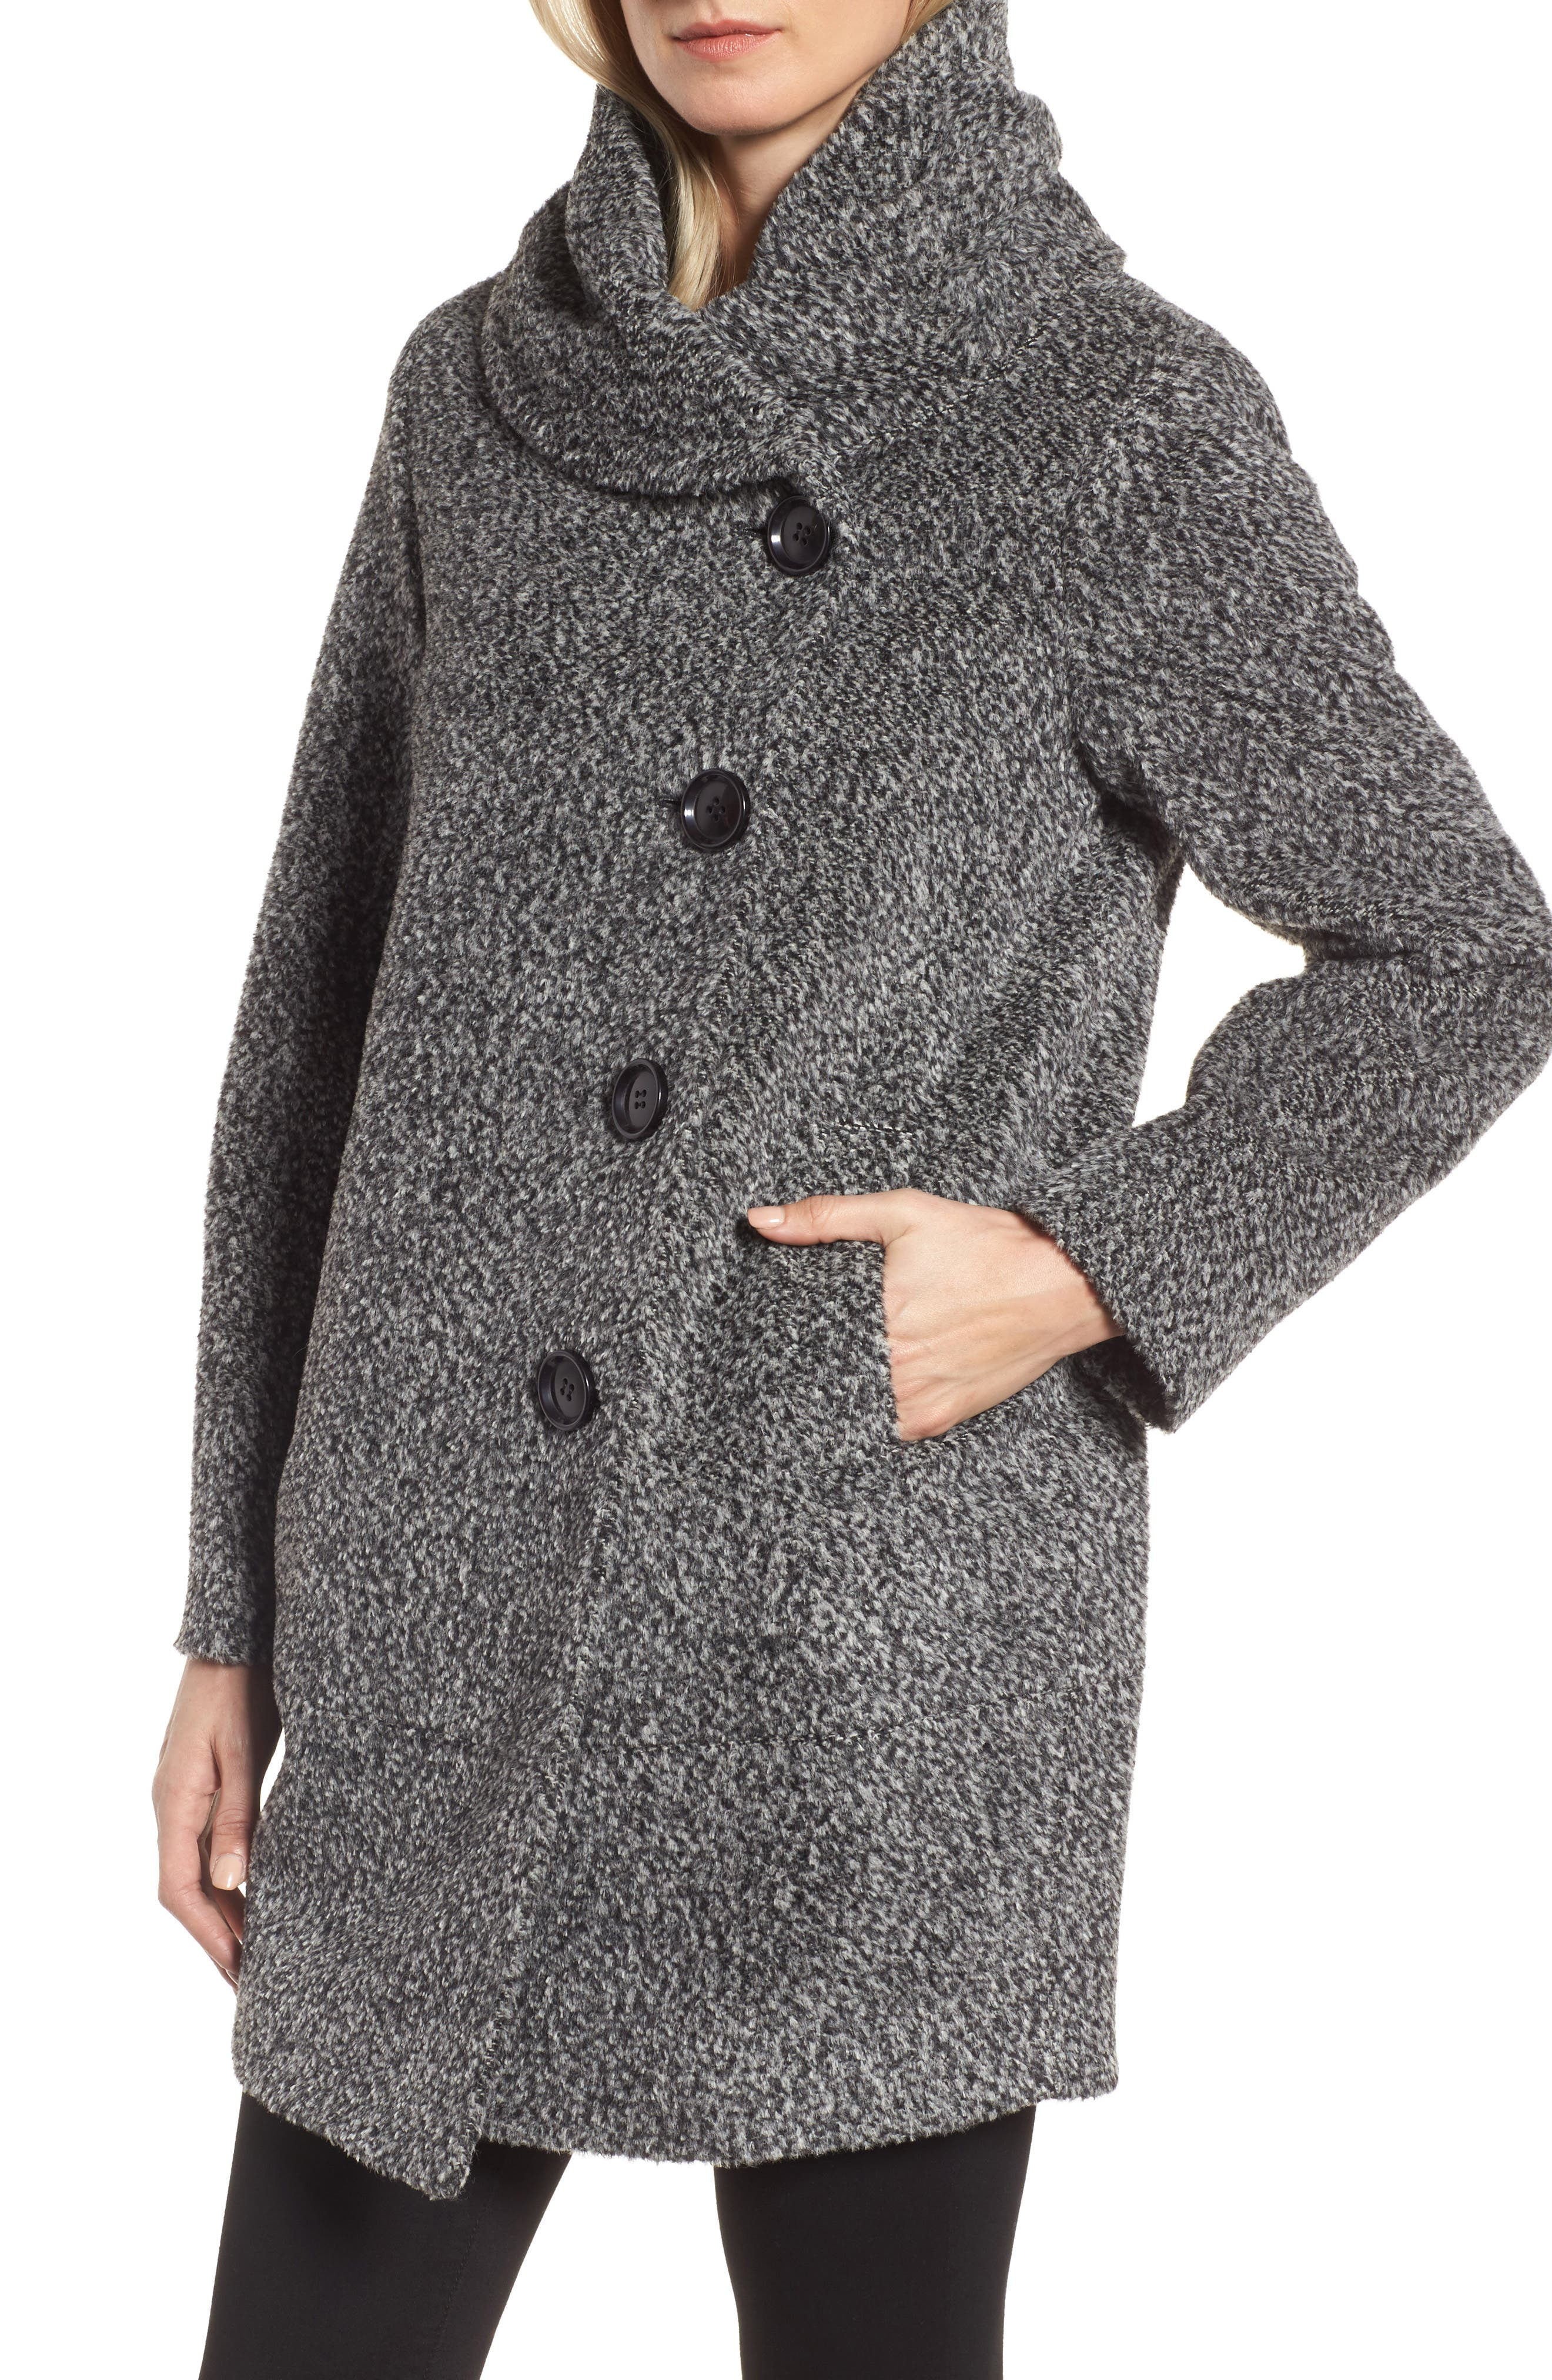 Wool Blend Coat,                             Alternate thumbnail 4, color,                             011